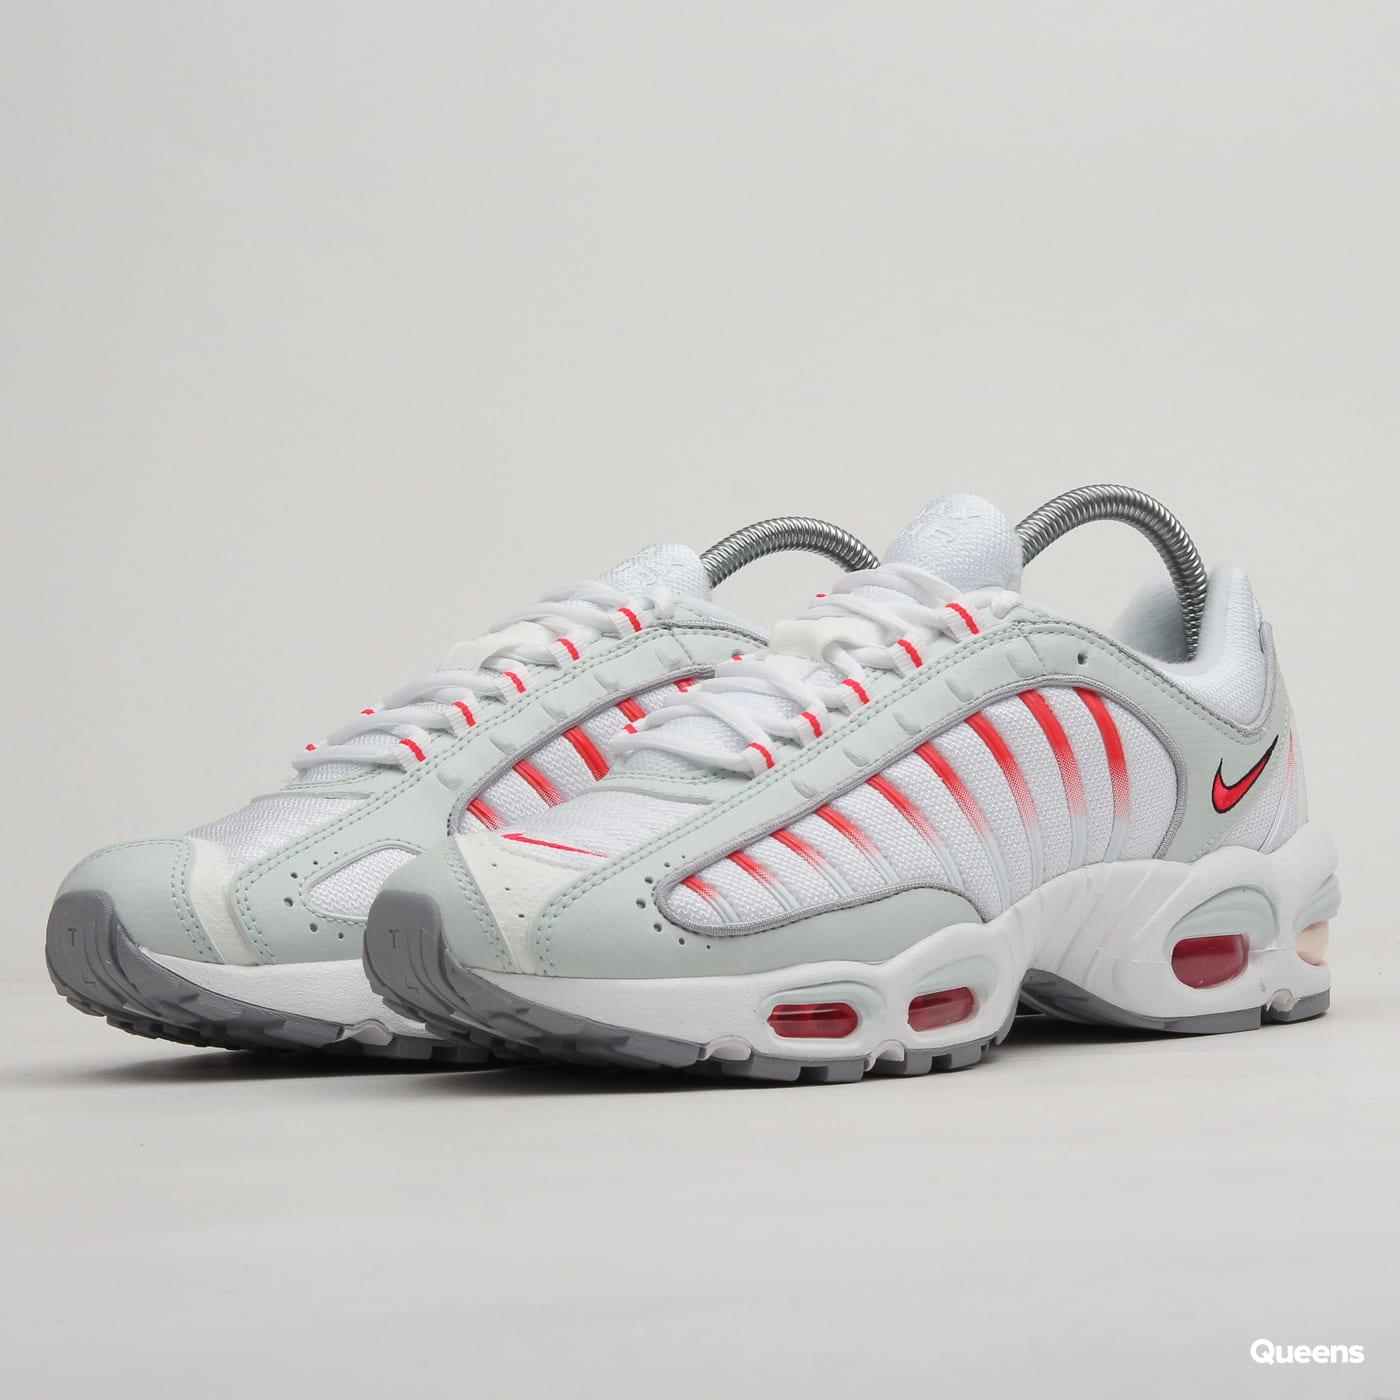 89b90b898c Sneakers Nike Air Max Tailwind IV ghost aqua / red orbit - wolf grey  (AQ2567-400) – Queens 💚